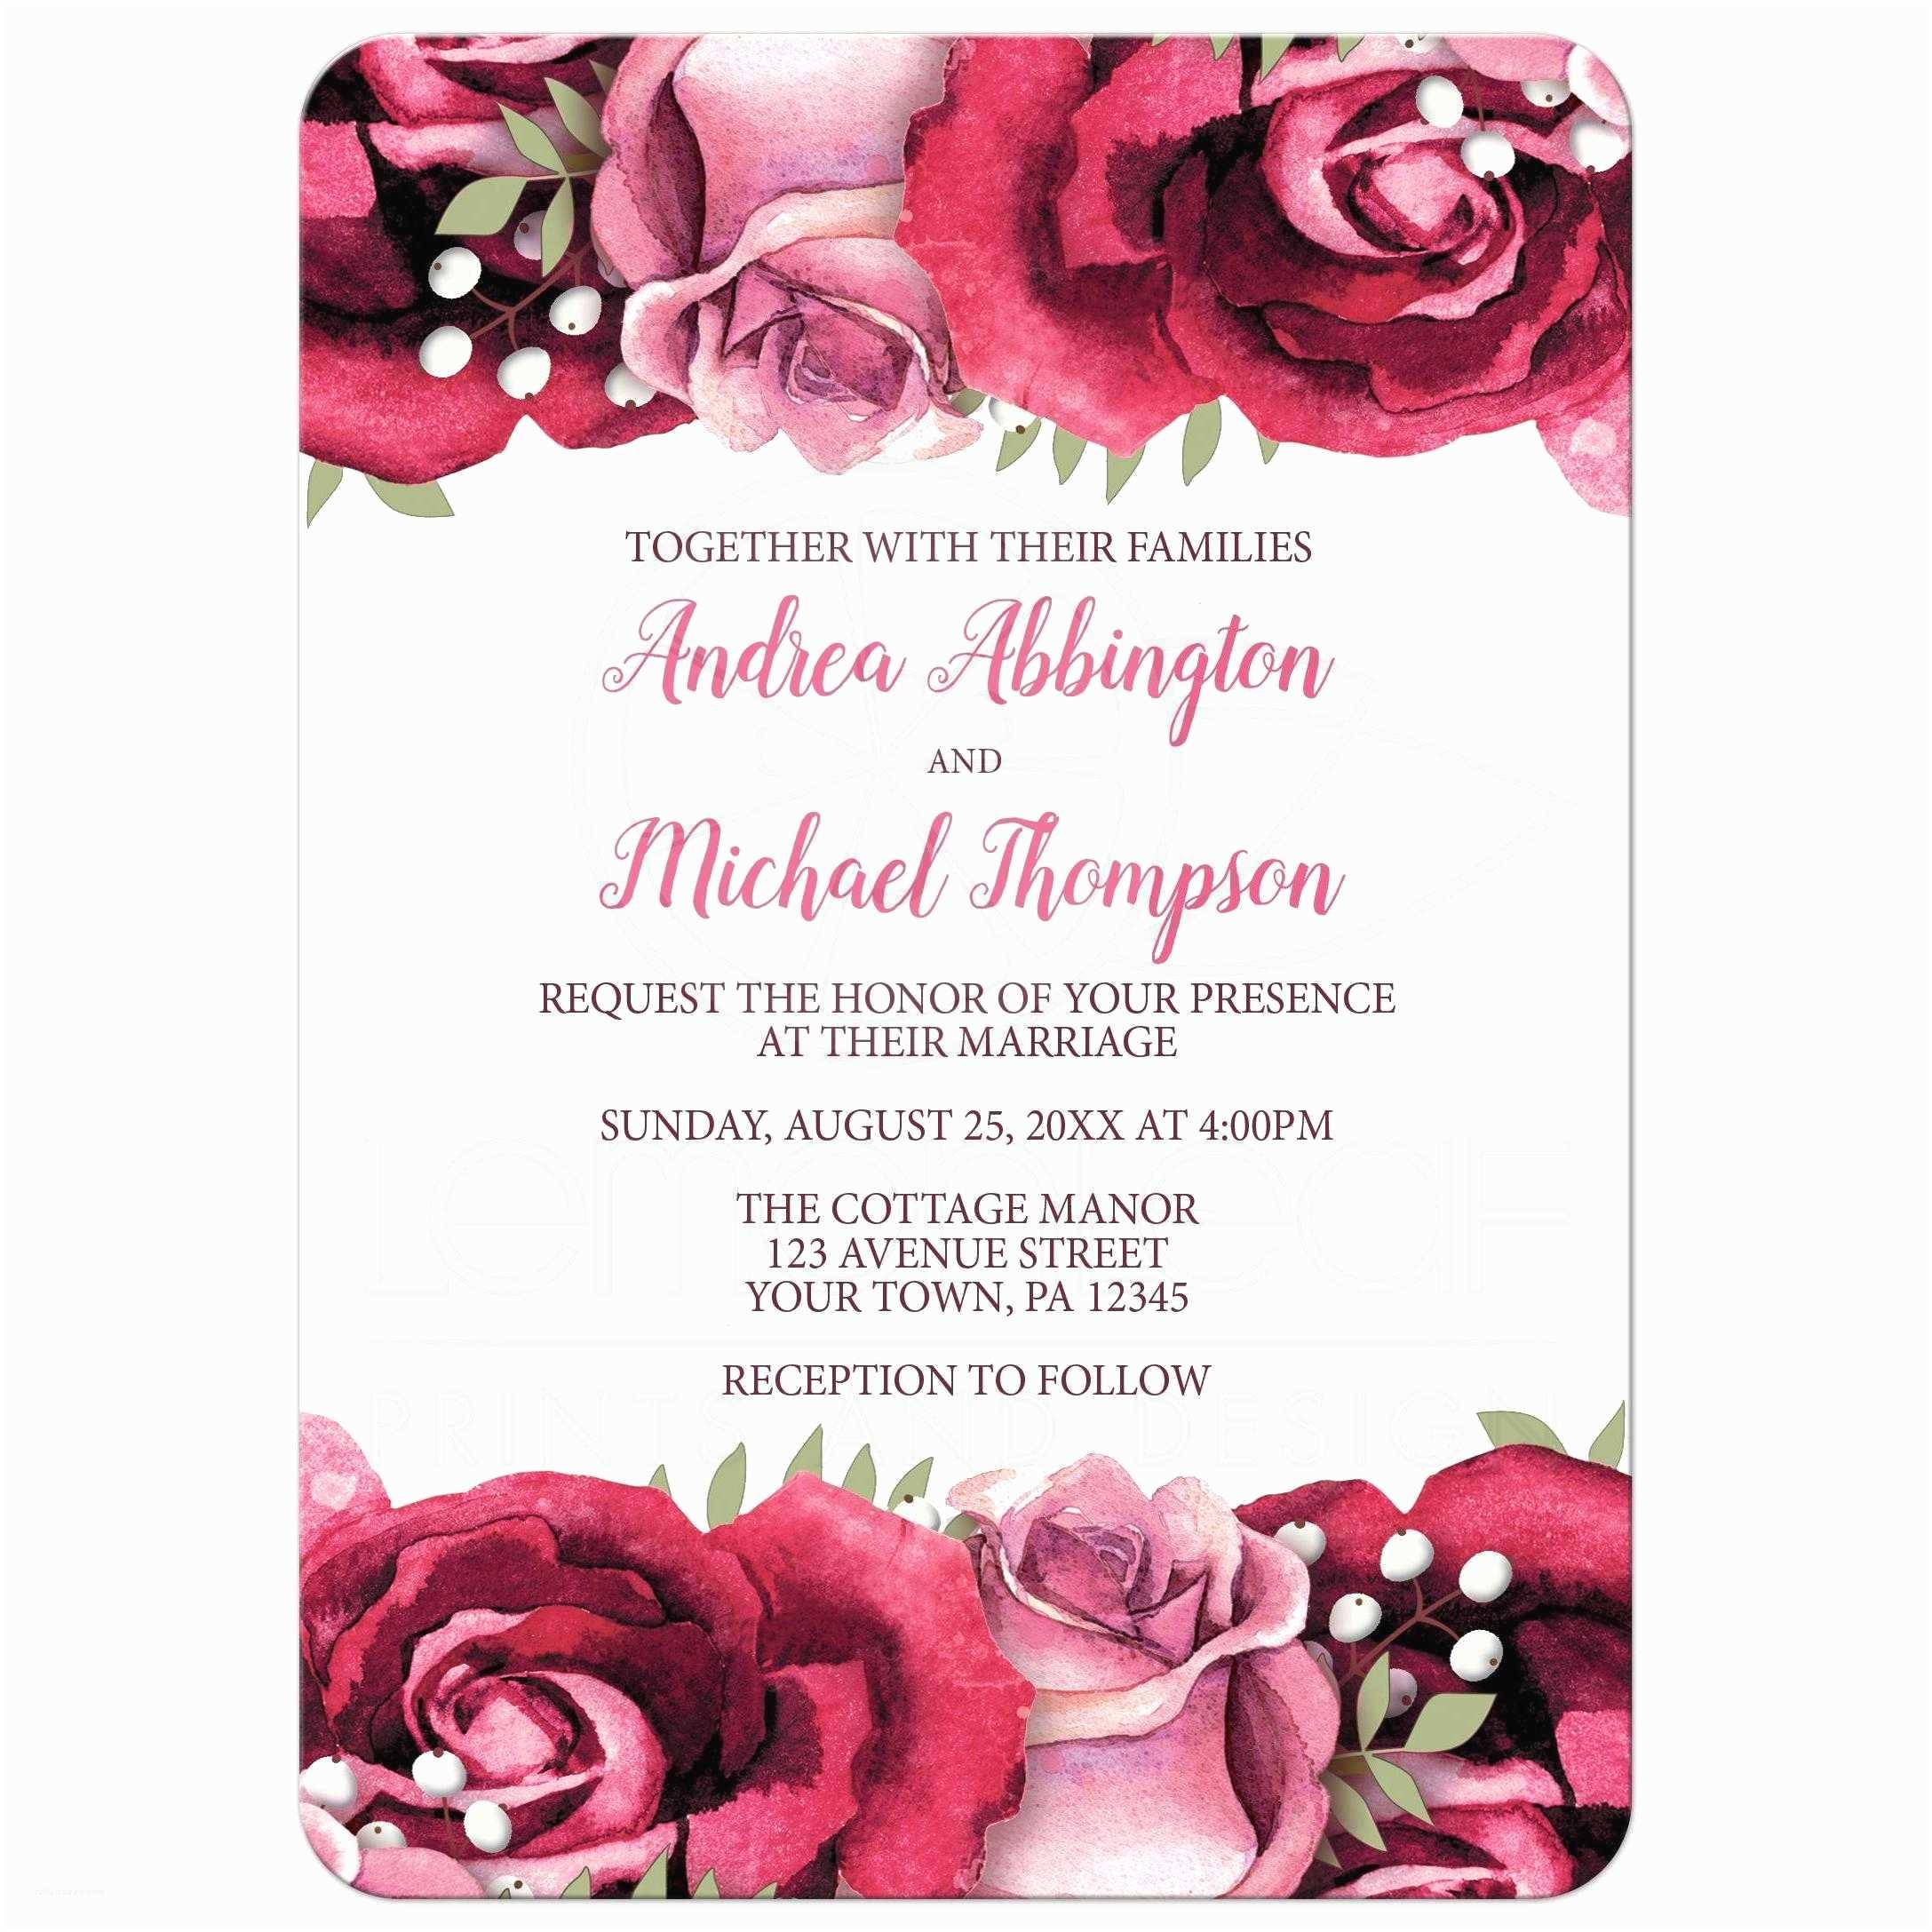 Burgundy and White Wedding Invitations Wedding Invitations Burgundy Pink Rose White Rustic